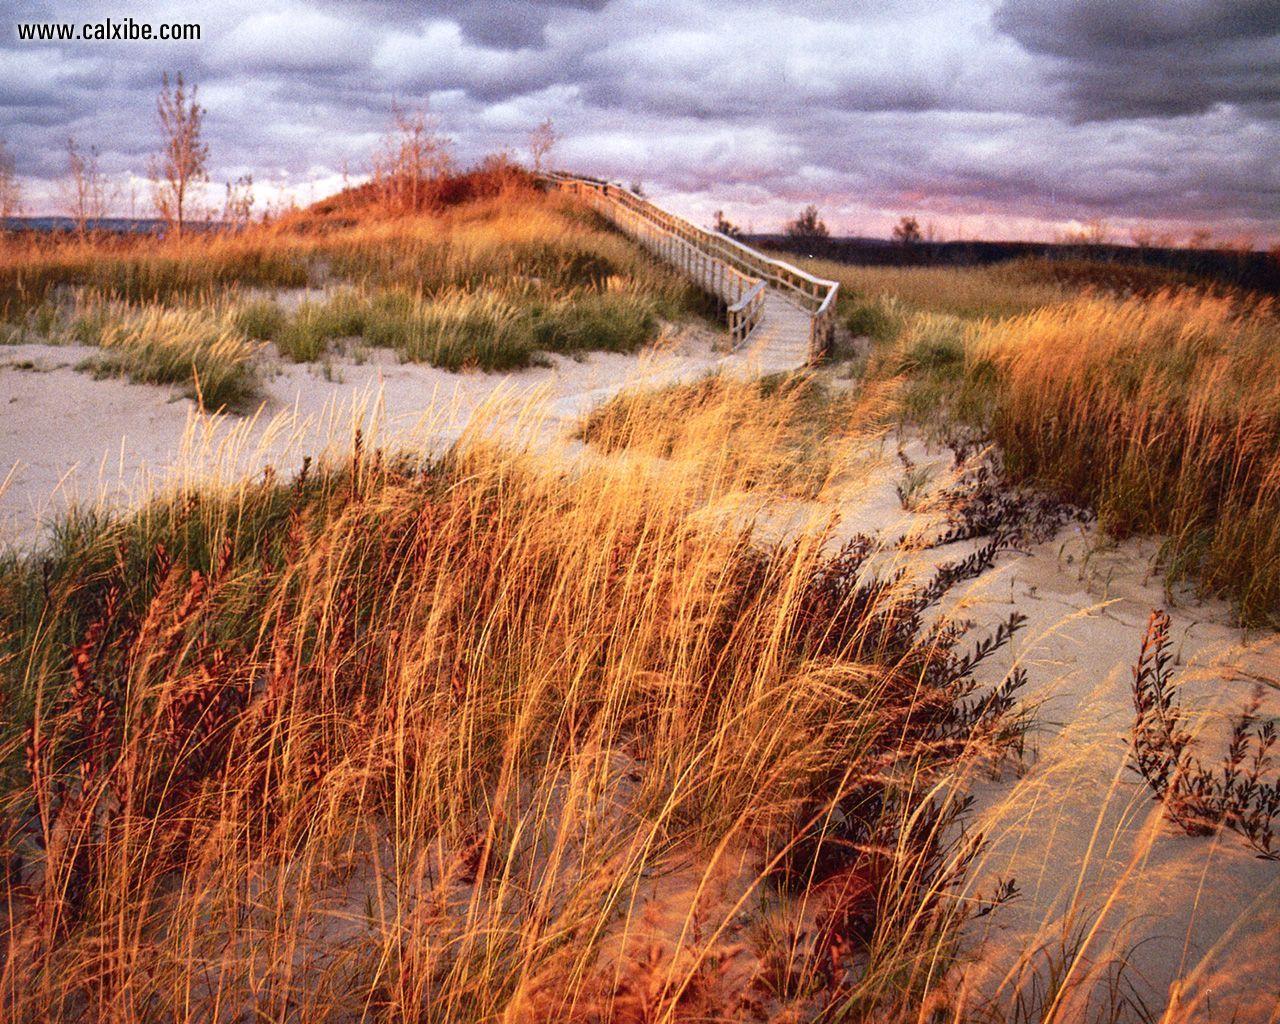 Nature Michigan Sleeping Bear Dunes boardwalk picture nr 5493 1280x1024